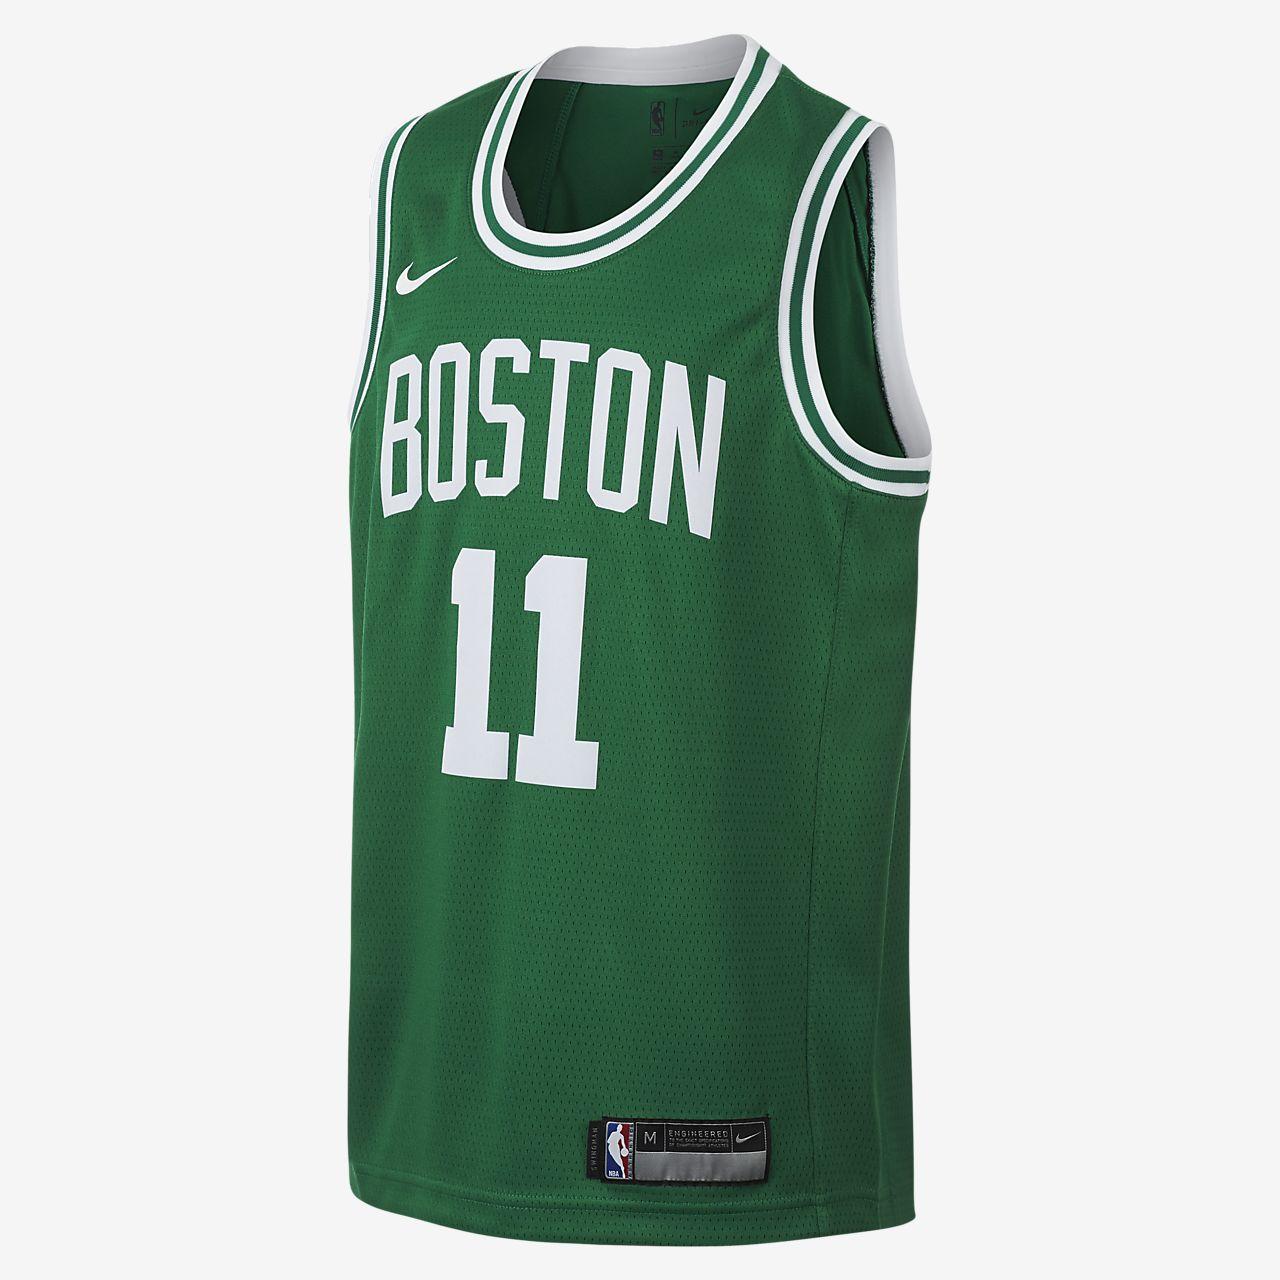 Kyrie Irving Boston Celtics Nike Icon Edition Swingman NBA-Trikot für Kinder